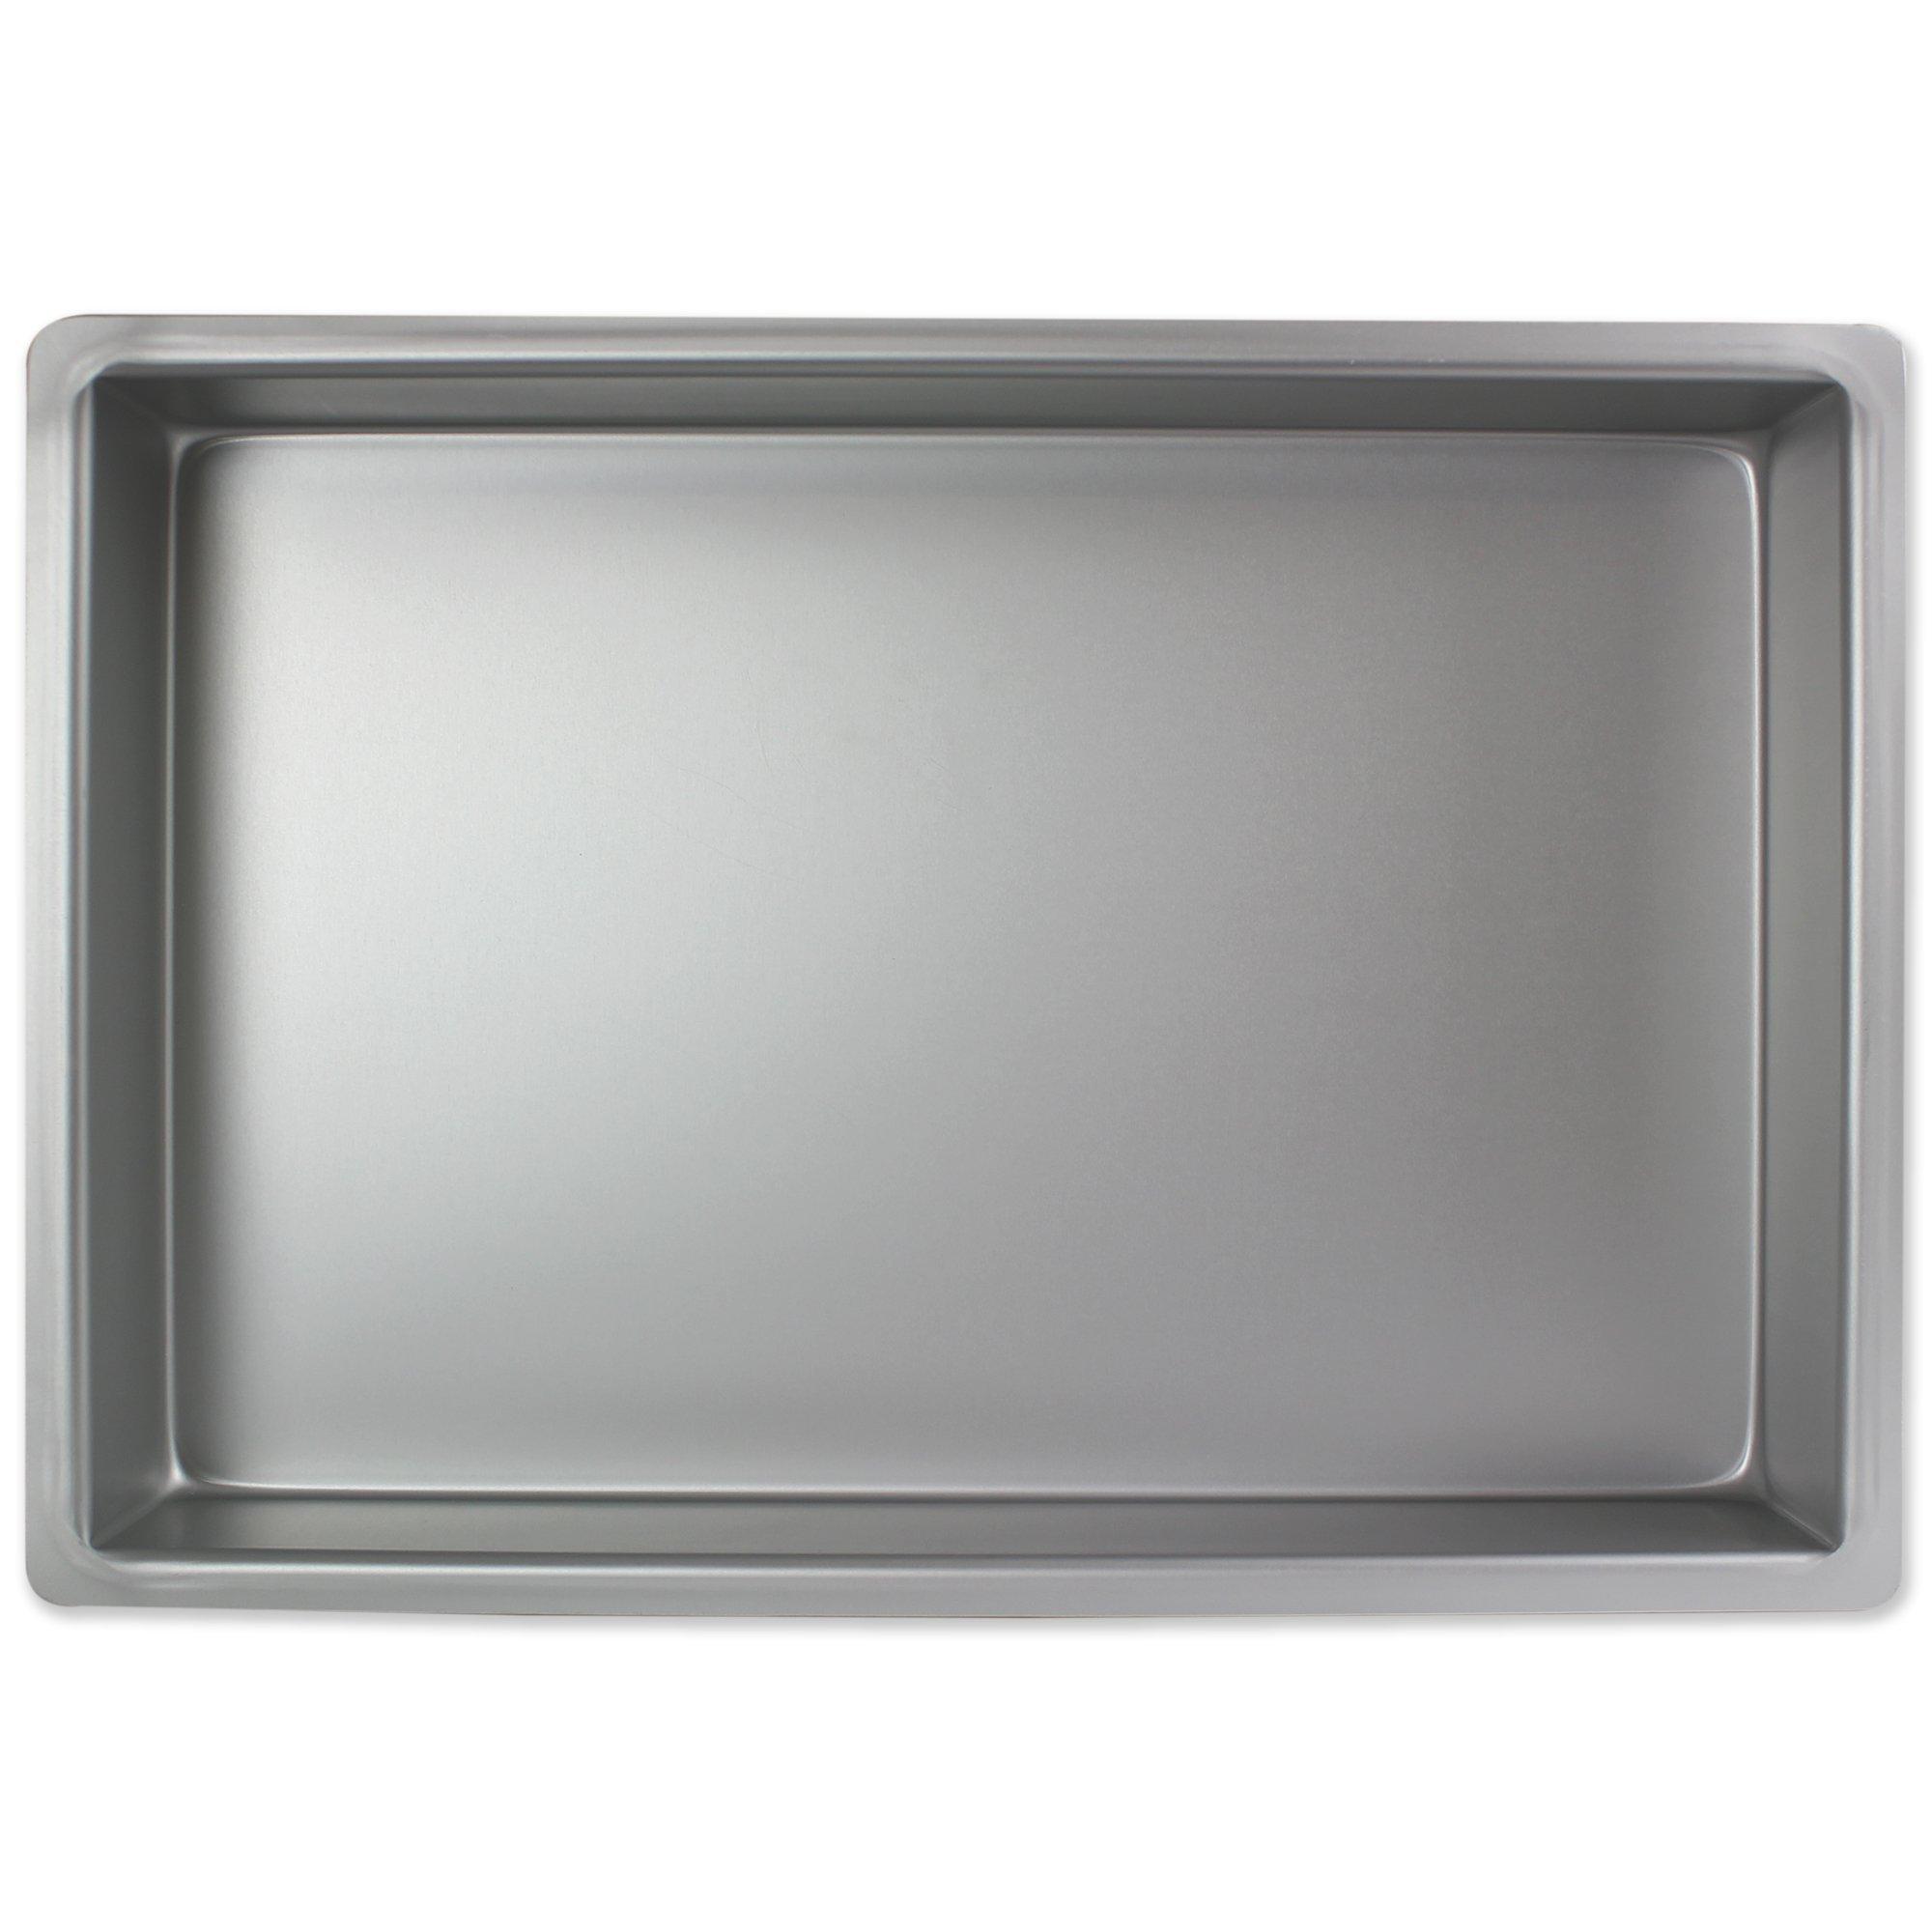 PME Professional Aluminum Oblong Cake Pan (9 x 13 x 4)''), Standard Silver